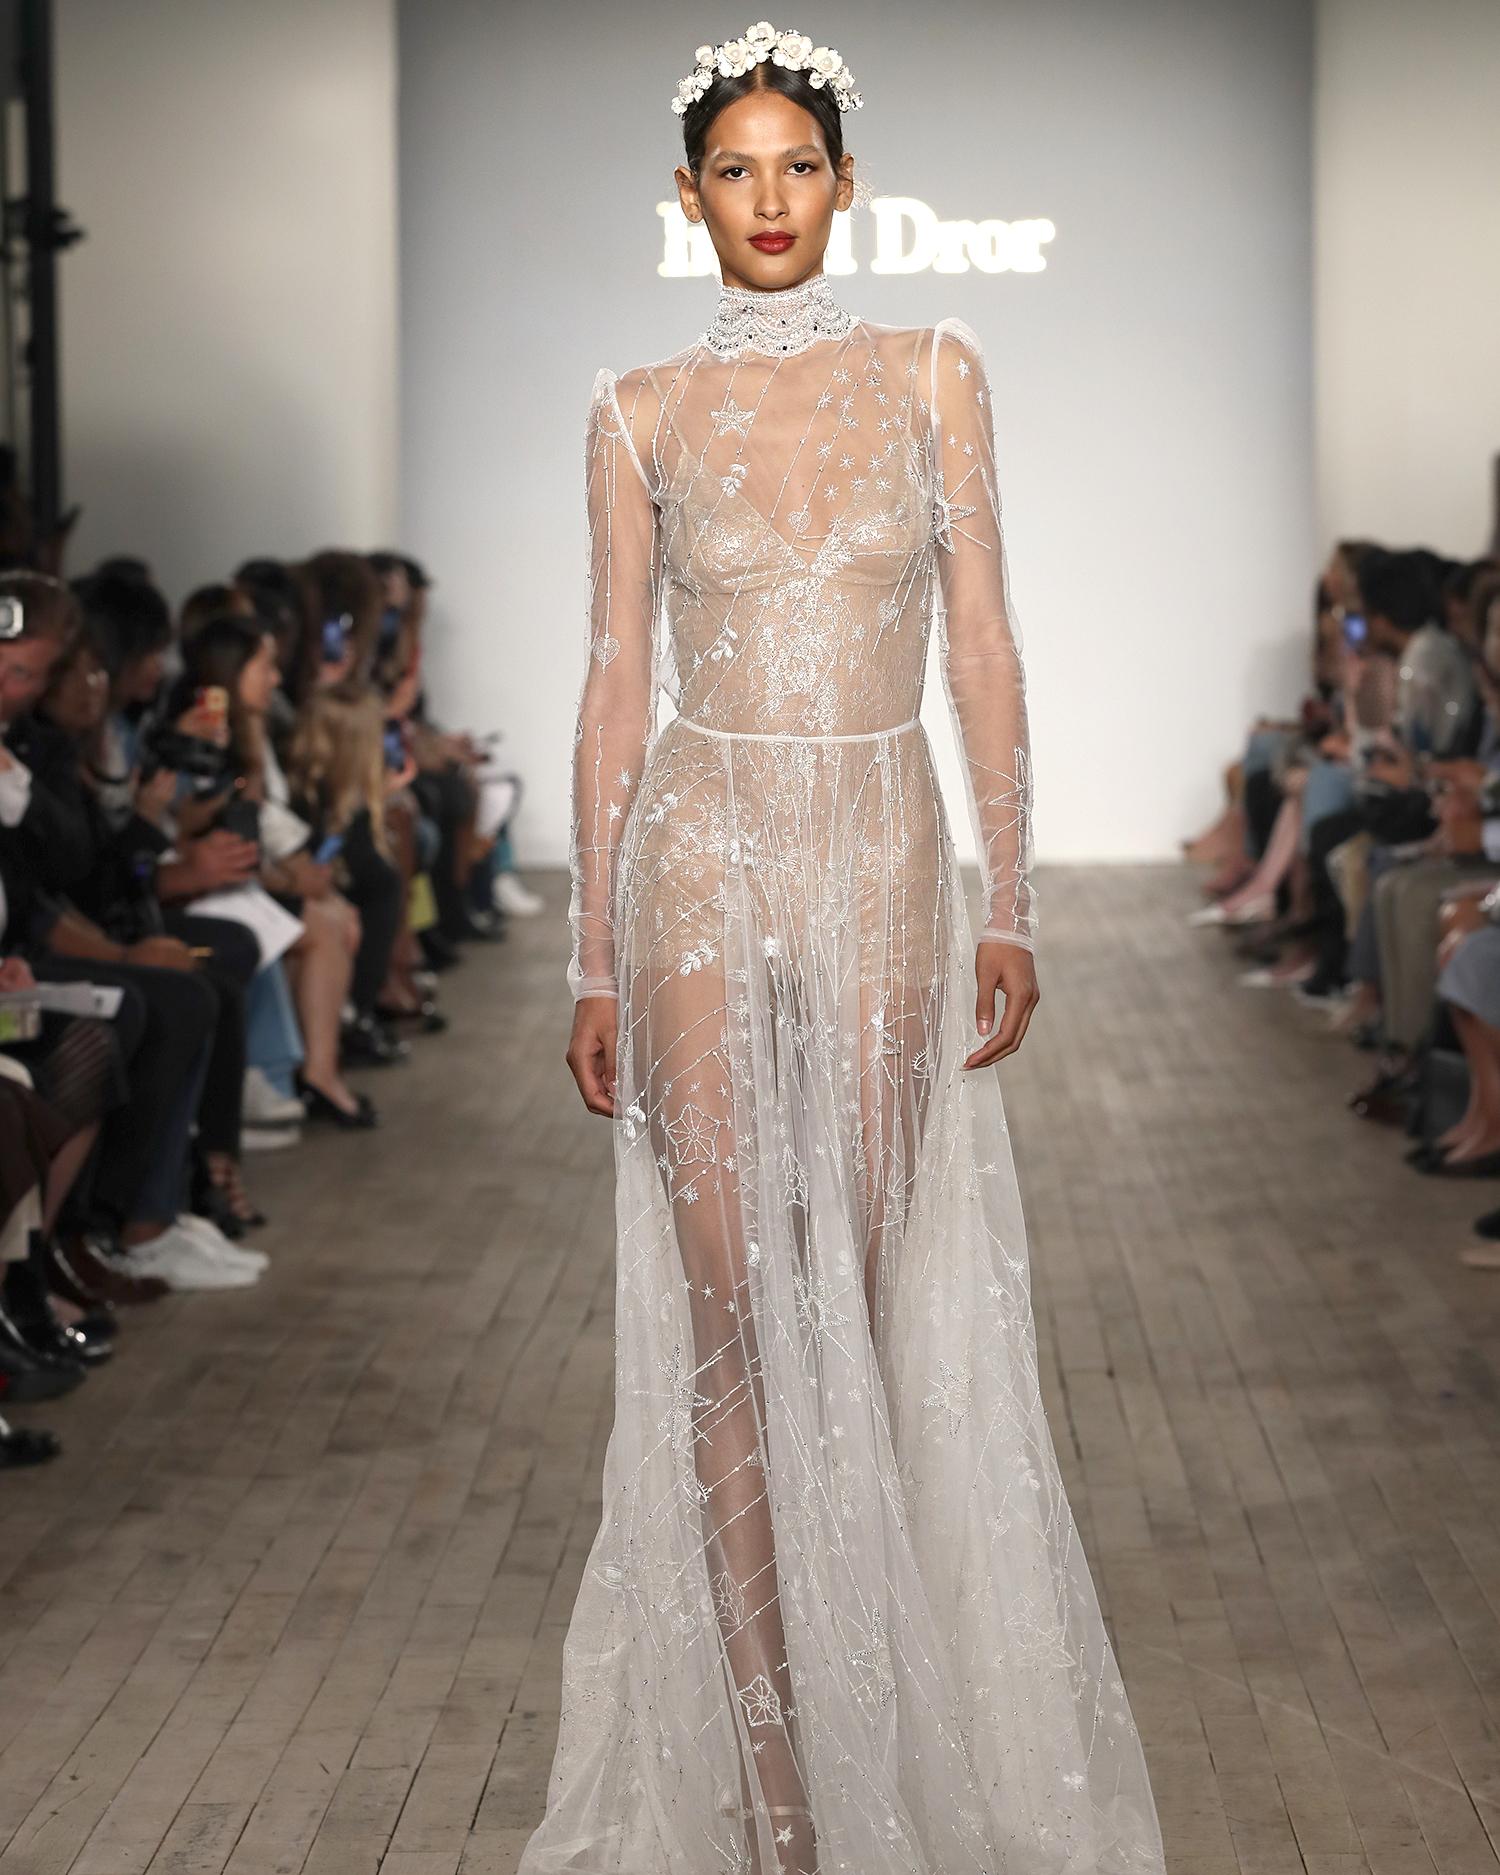 inbal dror wedding dress high-neck long-sleeved shear overlay